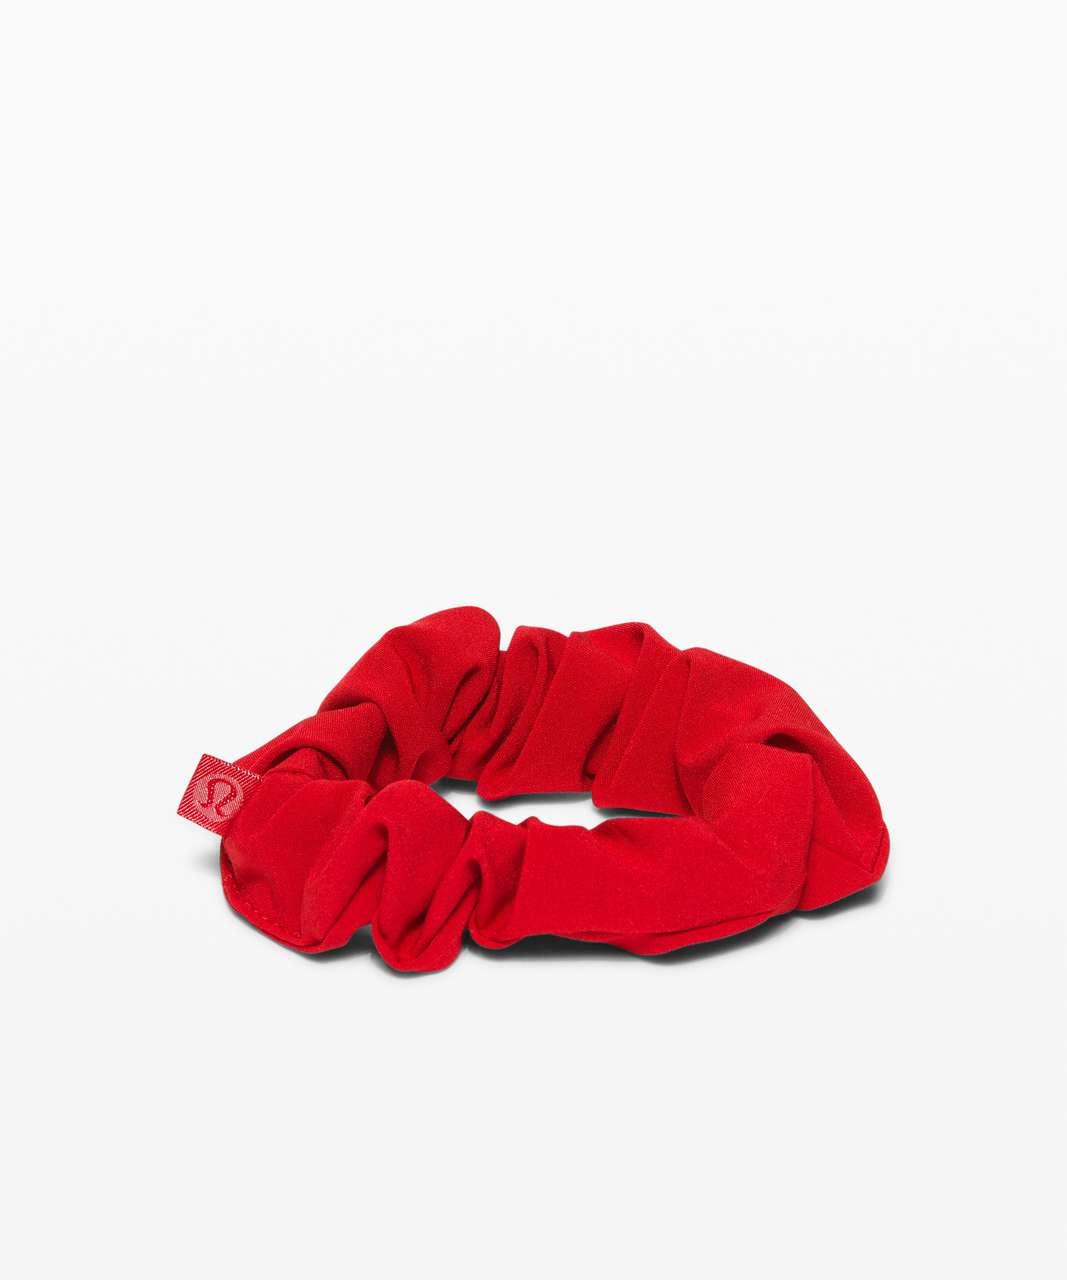 Lululemon Uplifting Scrunchie - Dark Red (First Release)